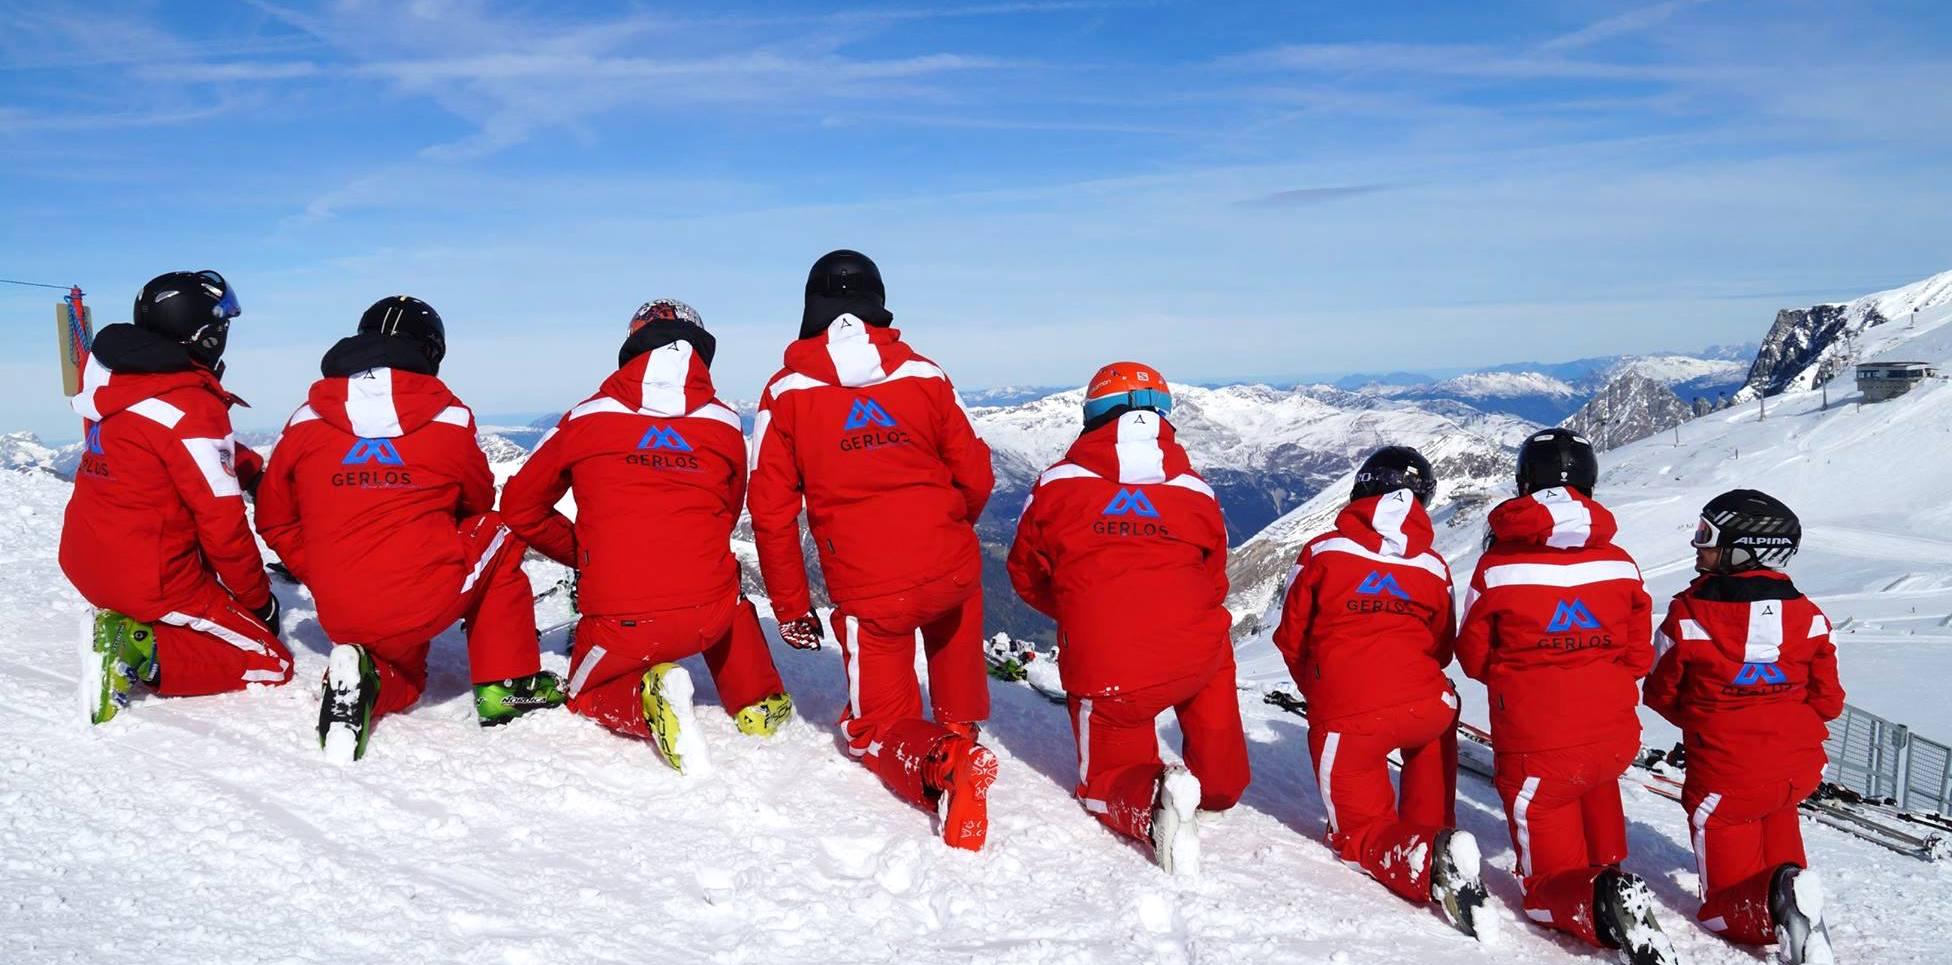 Wintersportschule Gerlos, Team, Skipodium